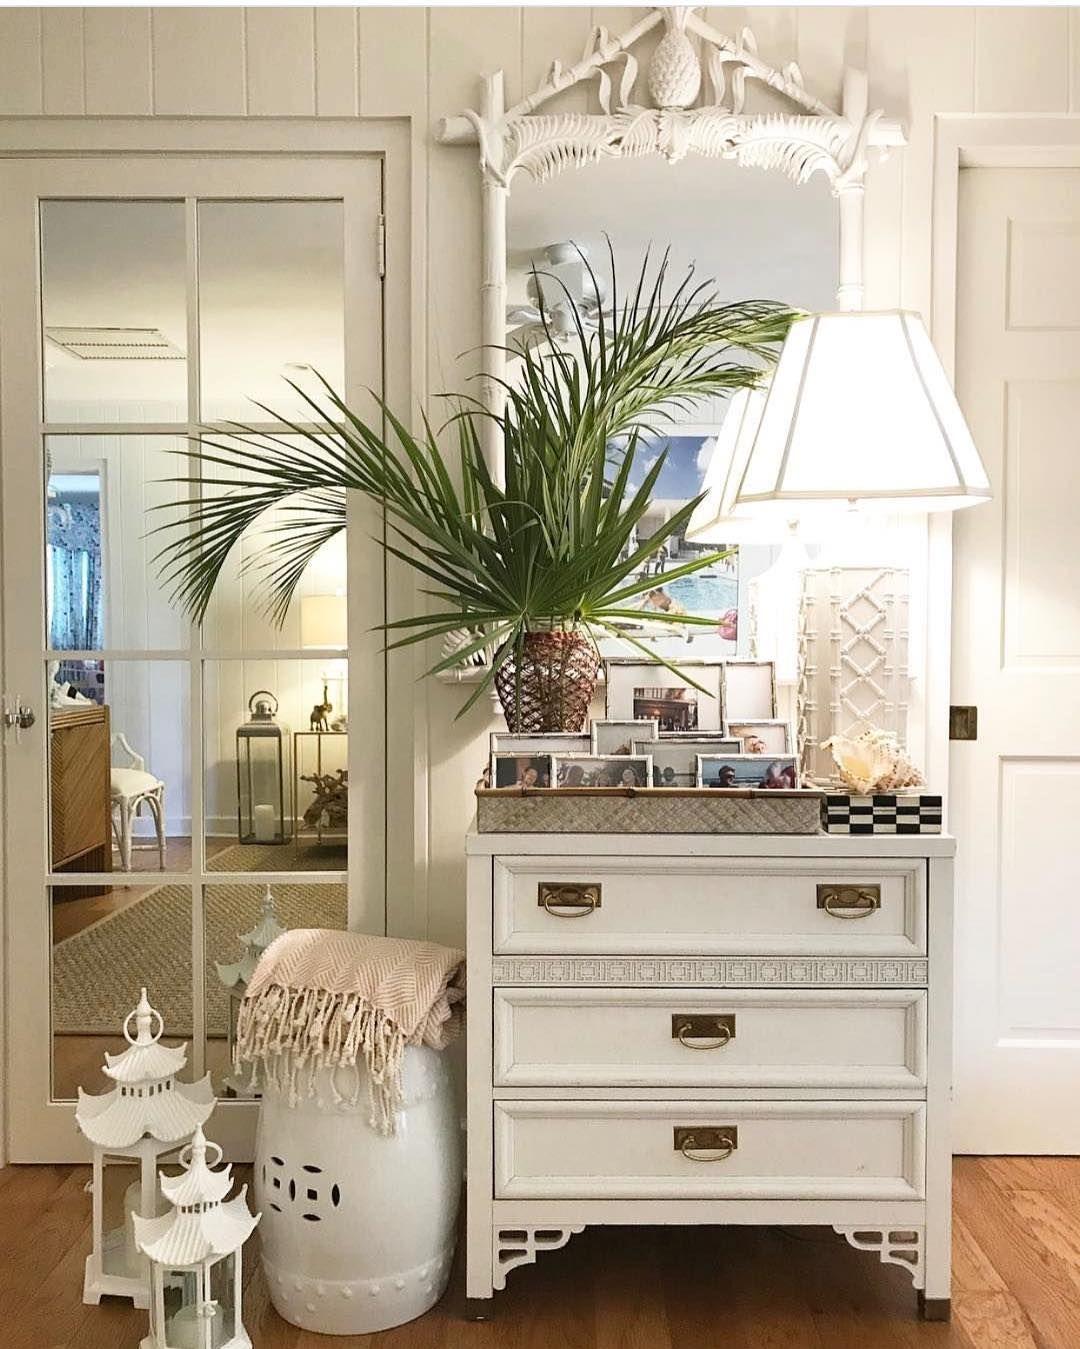 Pin By Cindy Miller On Livingroom Design In 2019